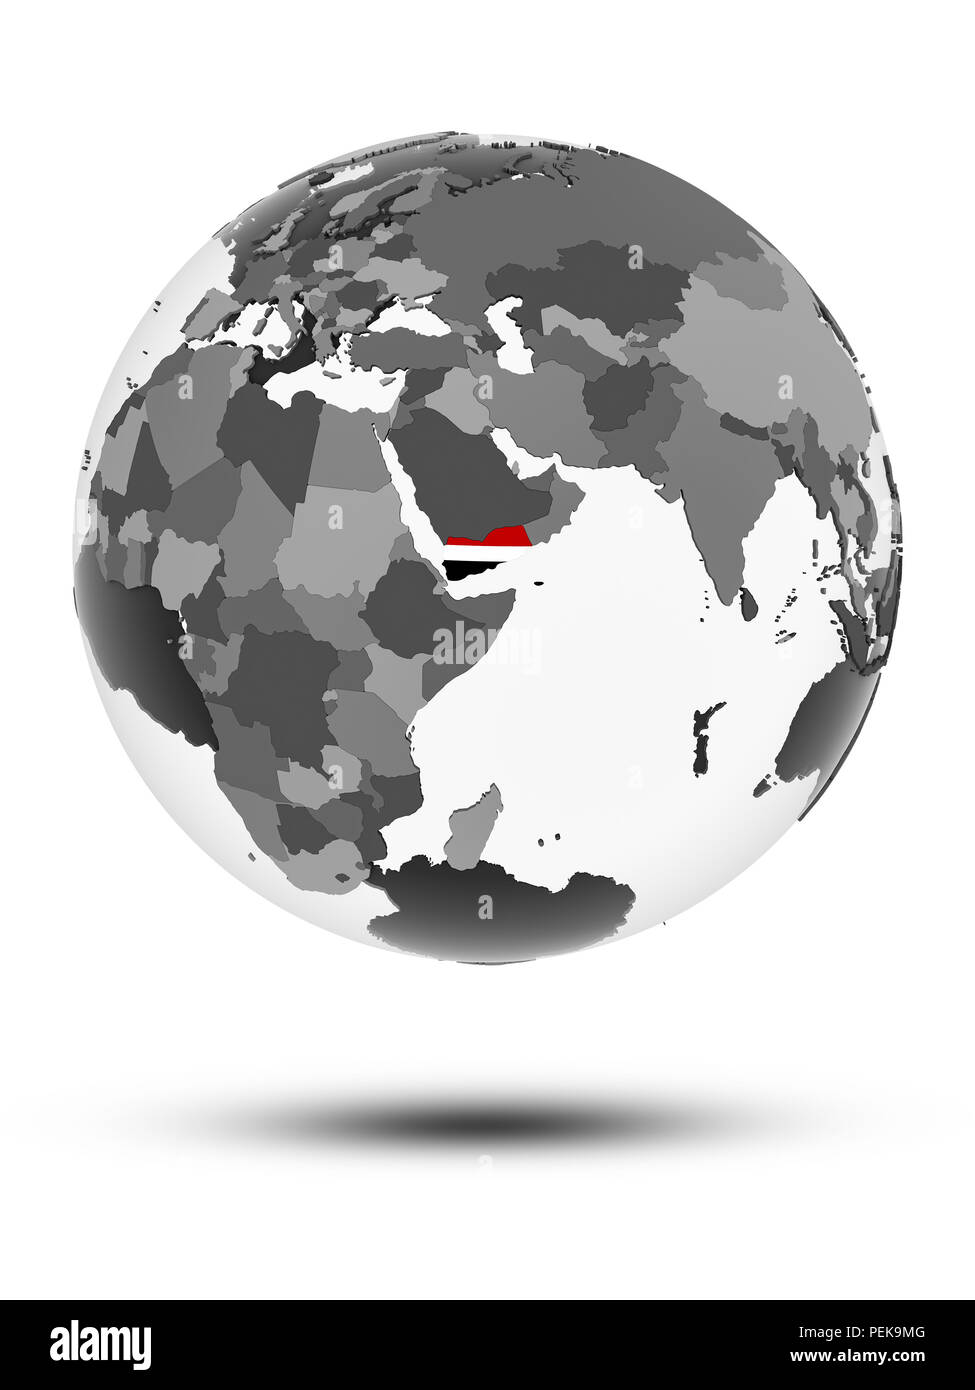 Yemen with flag on globe with shadow isolated on white background. 3D illustration. - Stock Image